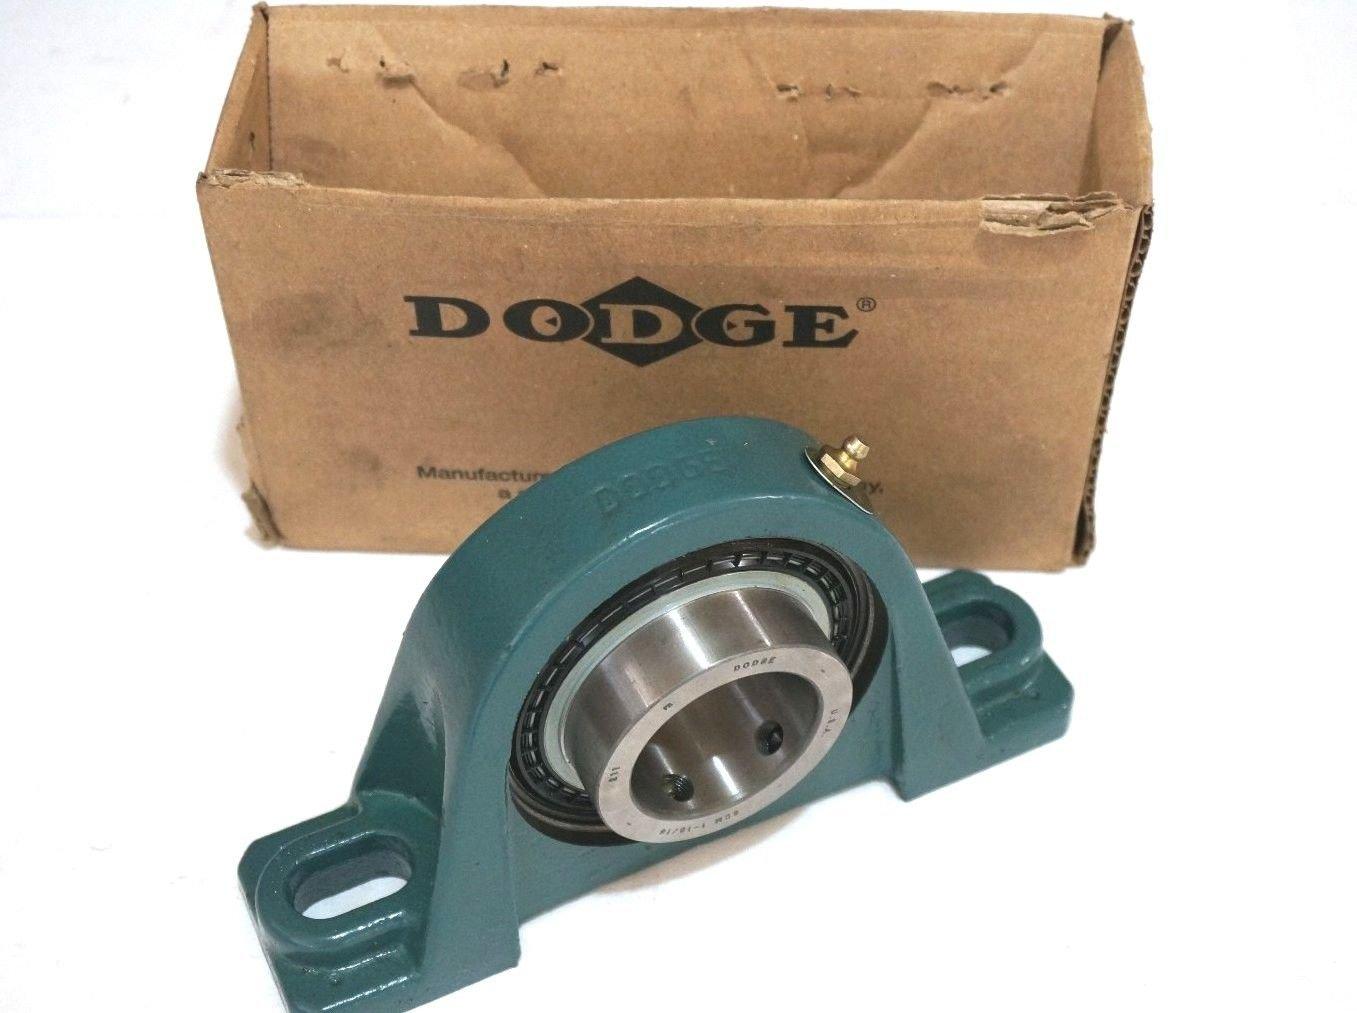 Dodge Bearing P2B-SCMED-115